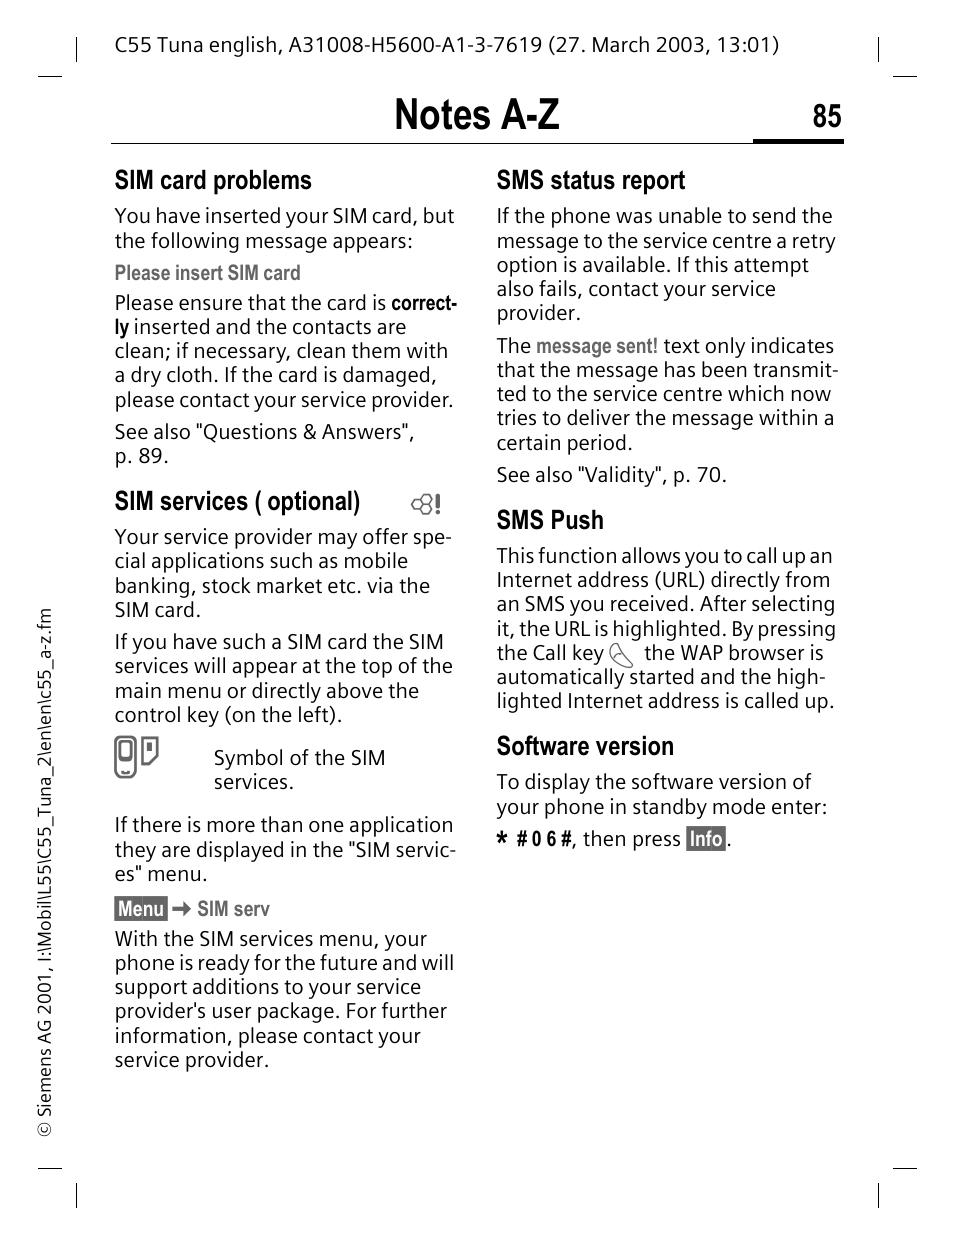 Sim services, Optional), P  85 | Siemens C55 User Manual